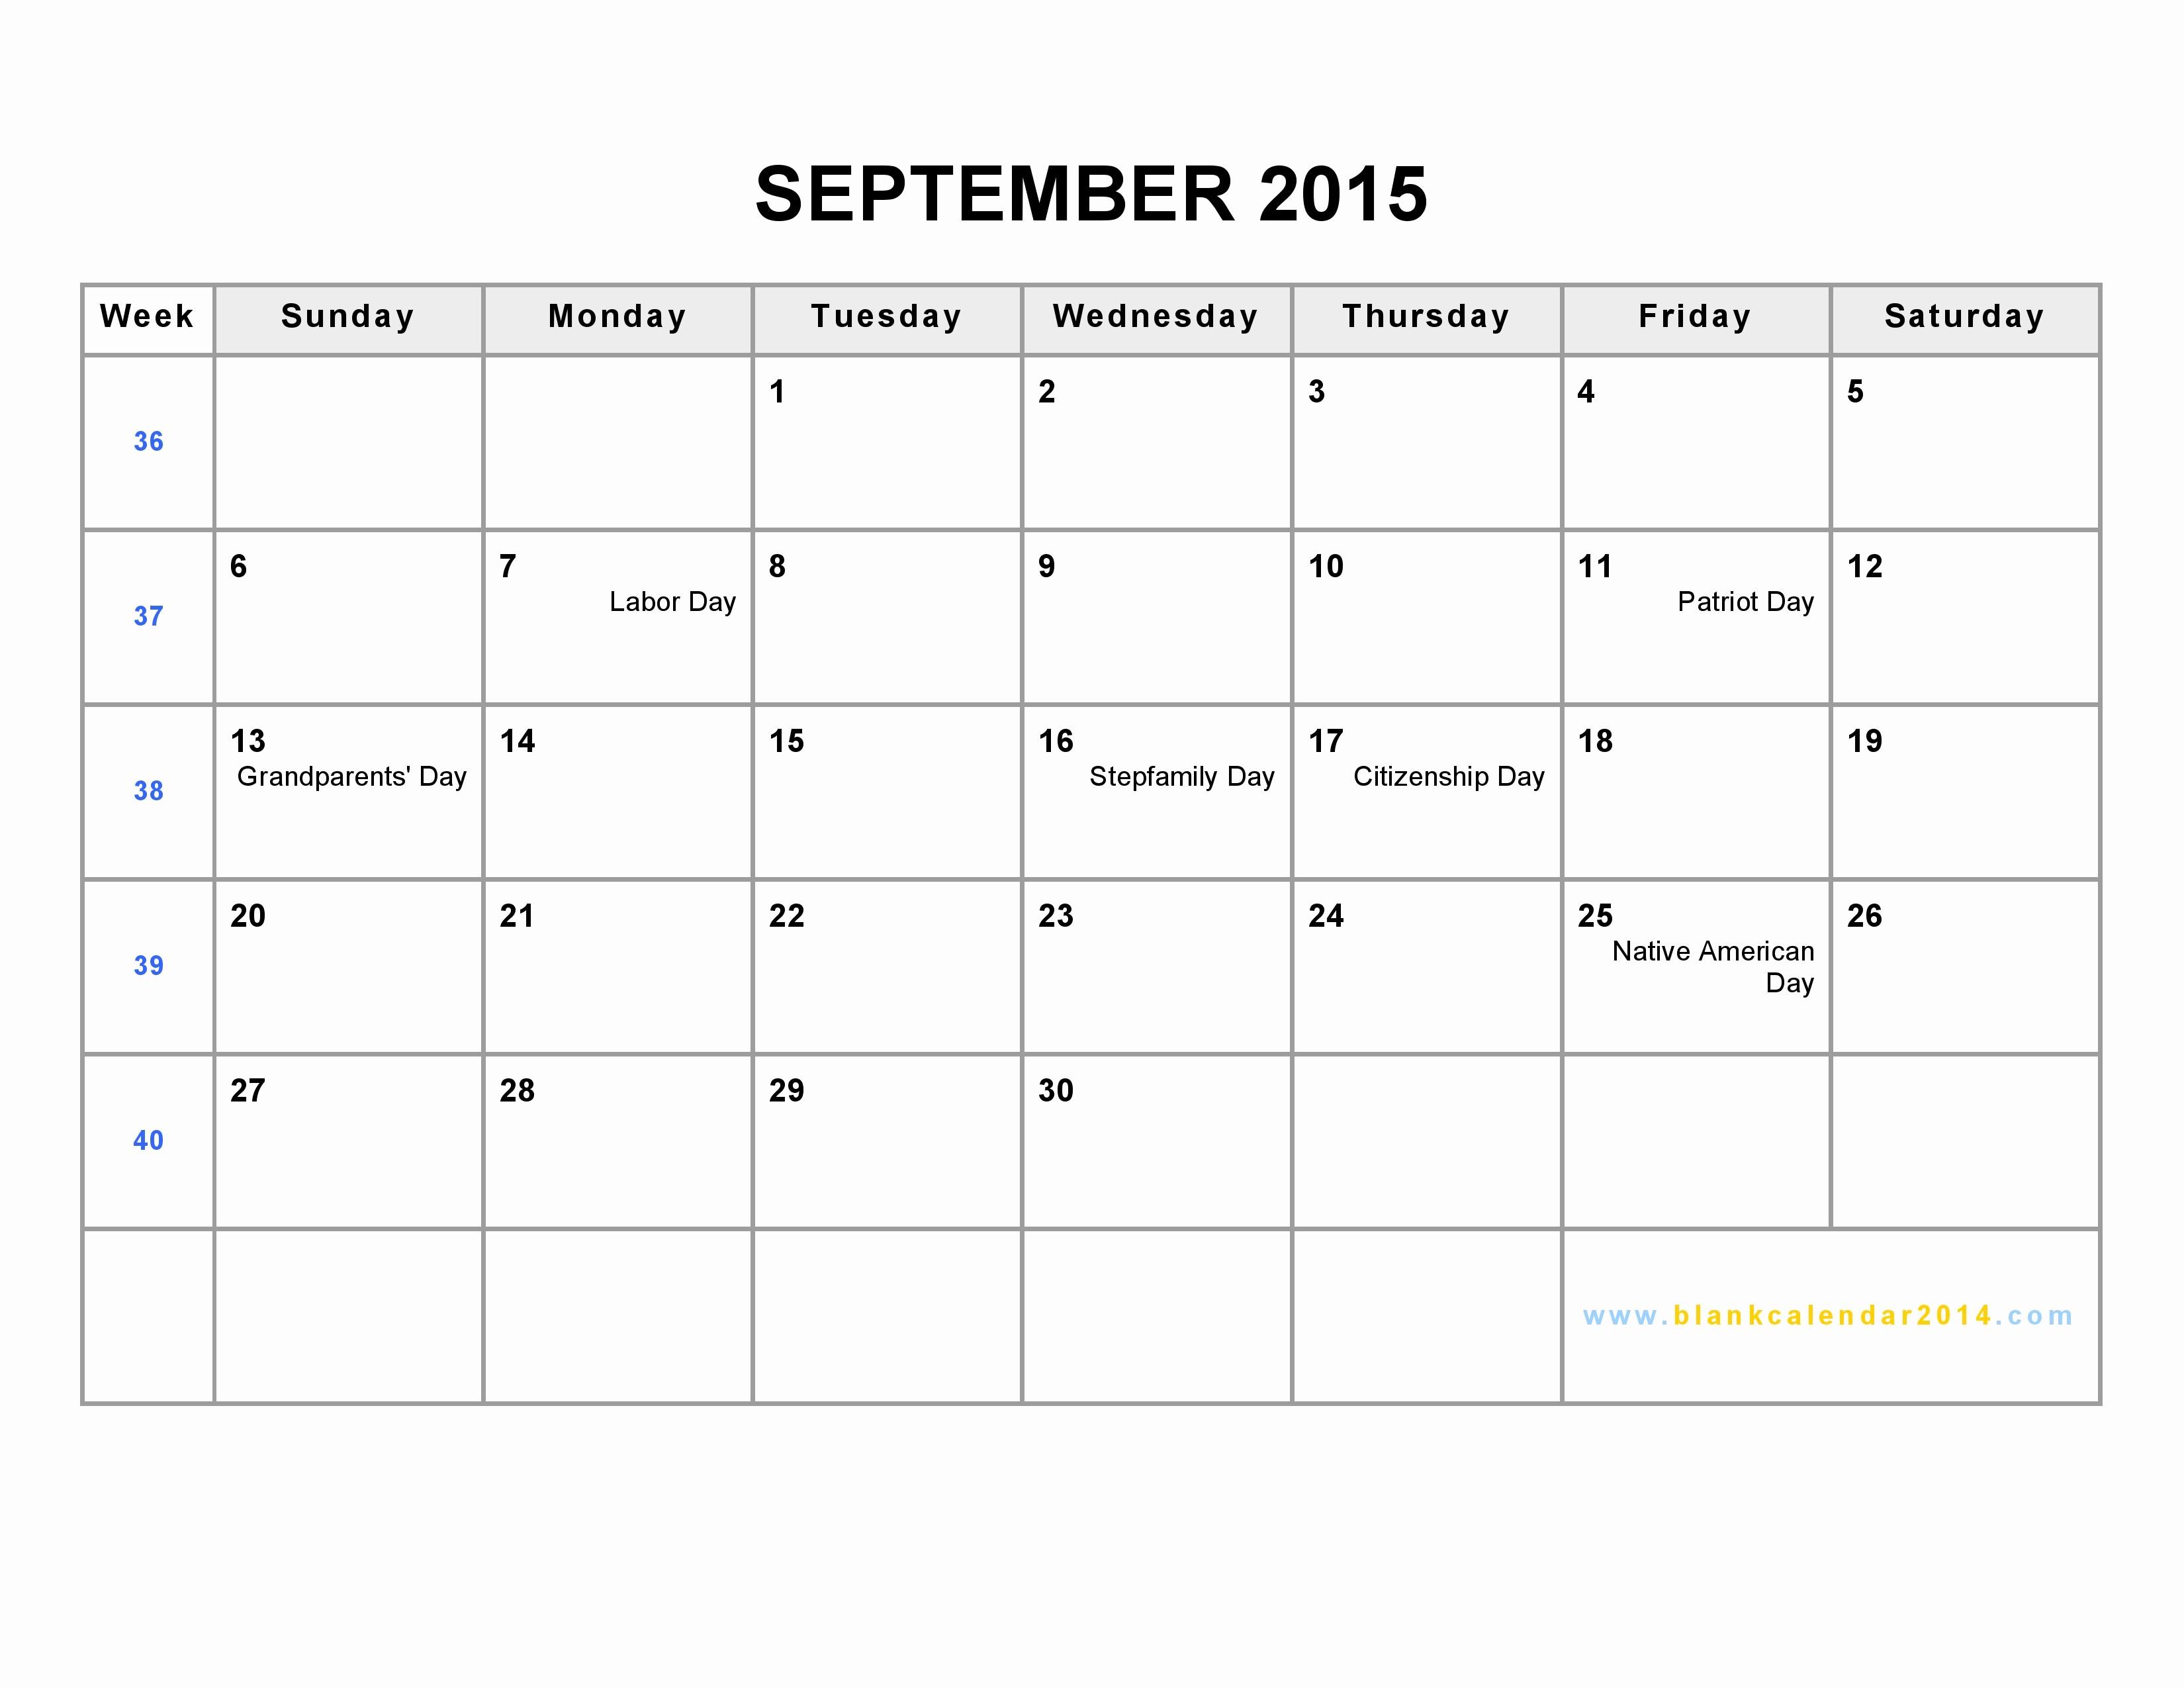 Free Monthly Calendar Templates 2015 Elegant 2015 Monthly Calendar Printable Pdf 6 Best Images Of 2015